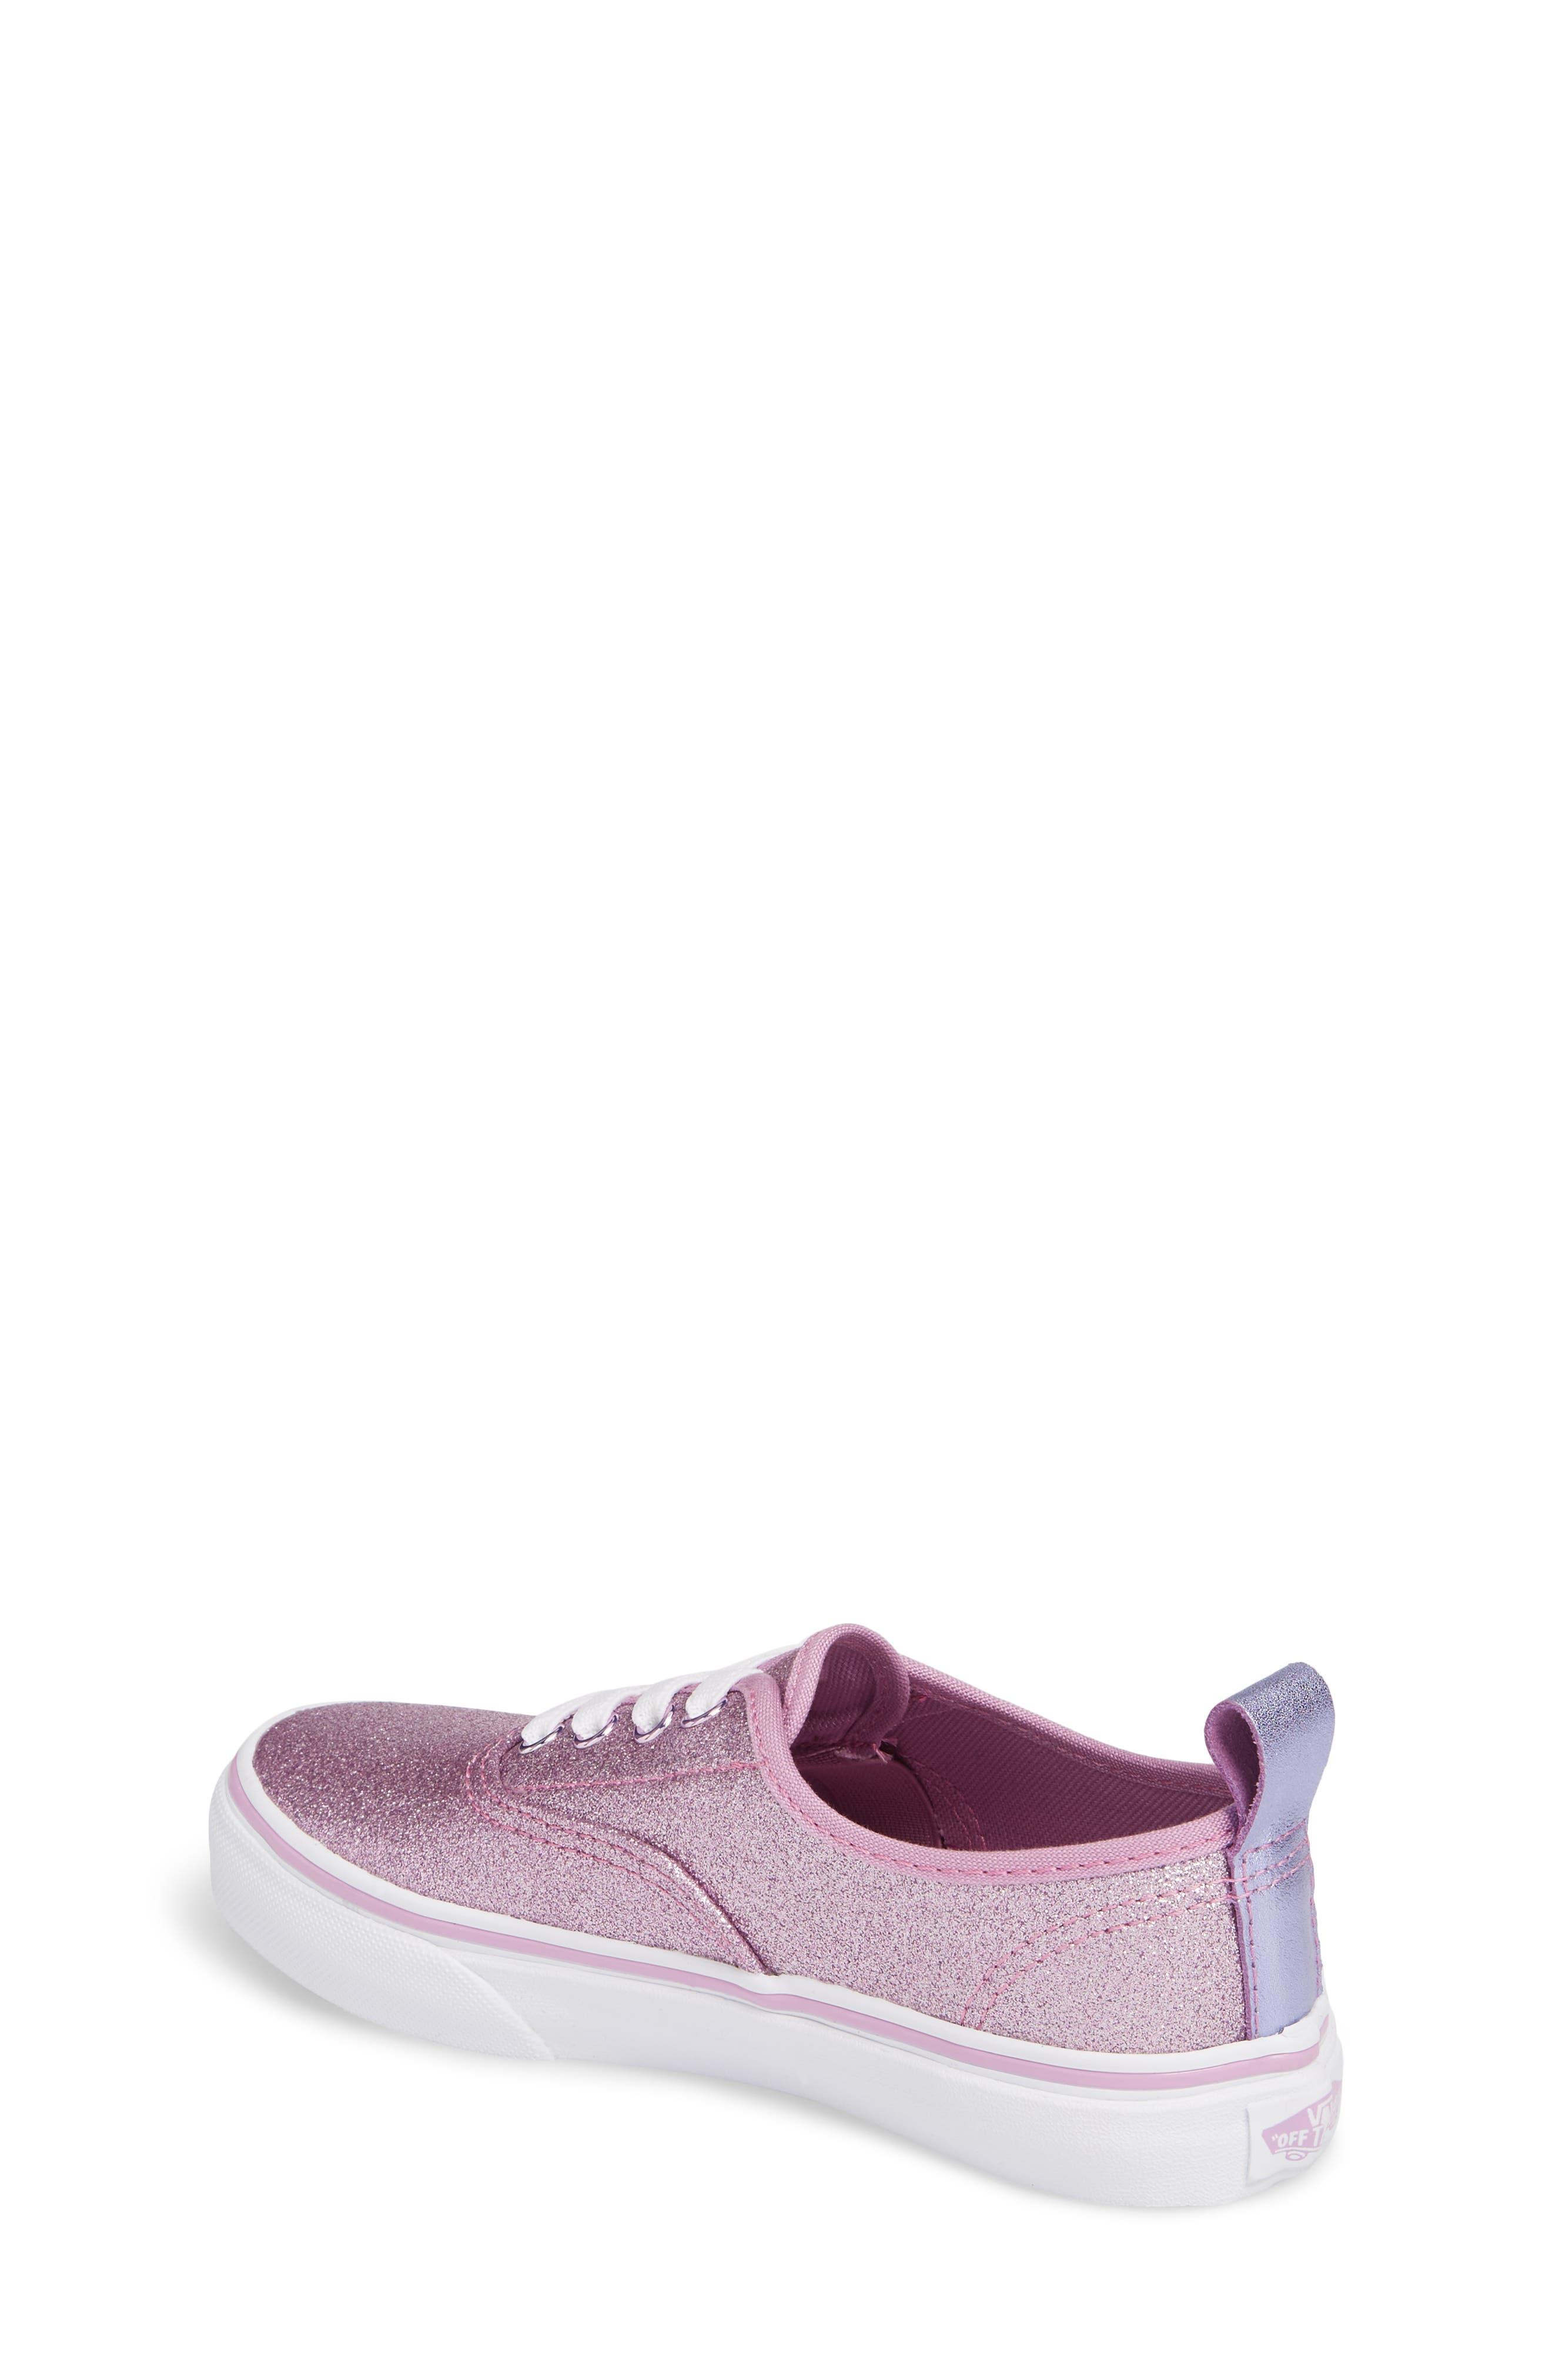 Alternate Image 2  - Vans Glitter Authentic Elastic Lace Sneaker (Baby, Walker, Toddler, Little Kid & Big Kid)